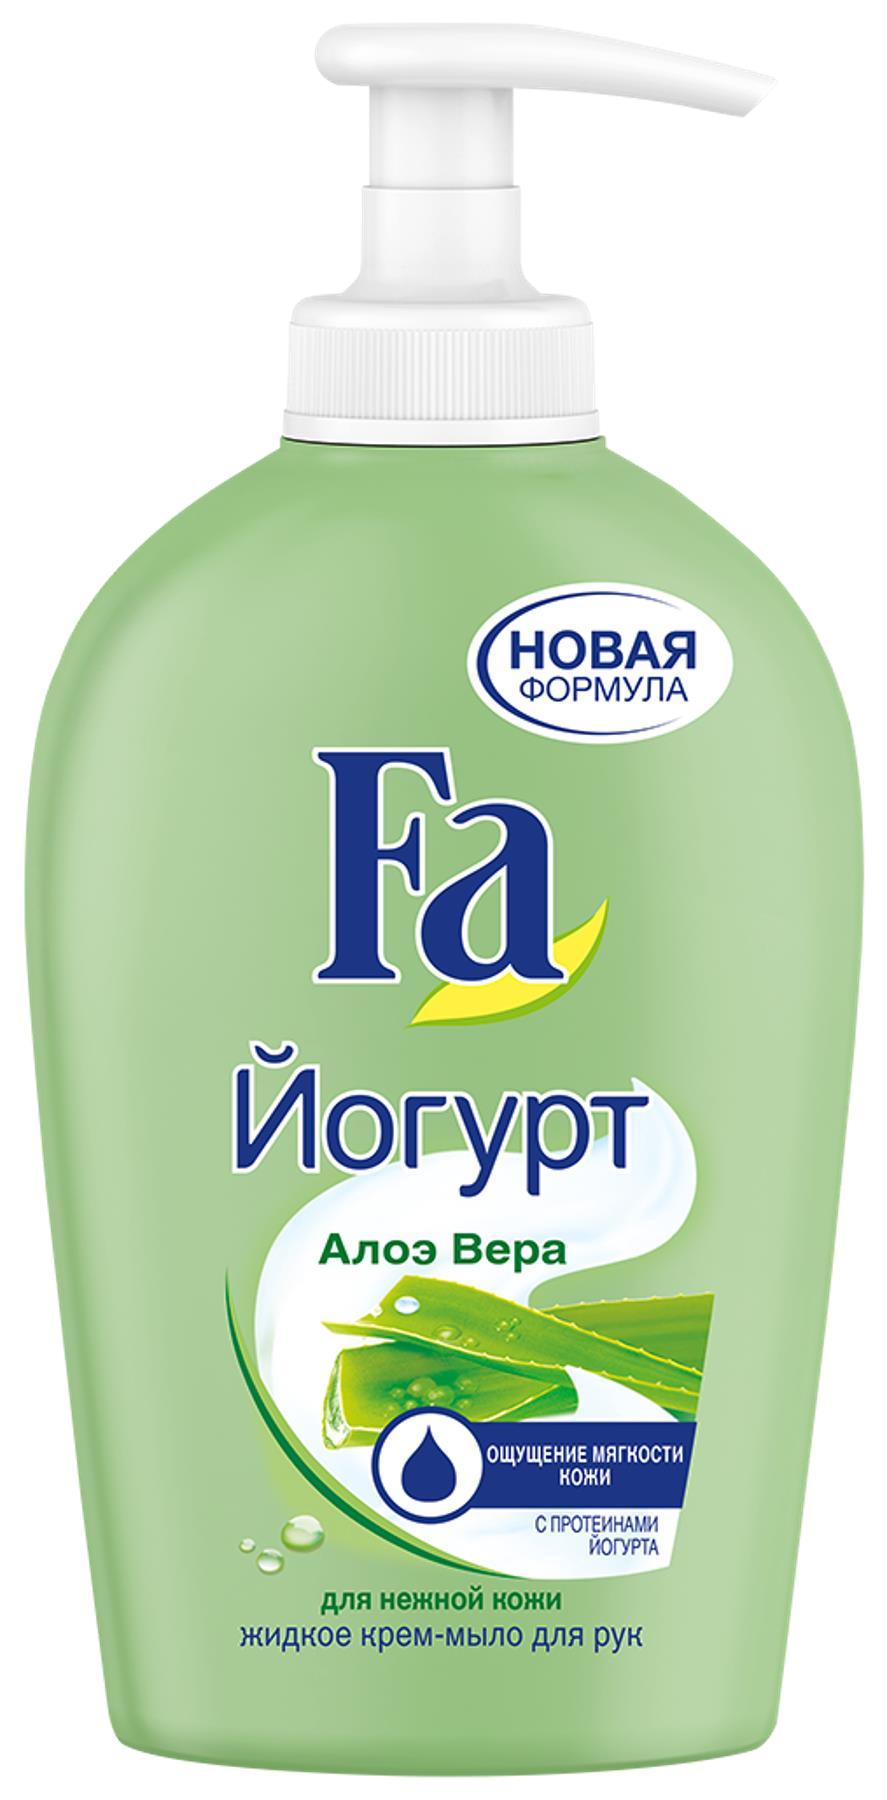 цены Fa Жидкое Мыло Yoghurt Алоэ Вера, 250 мл